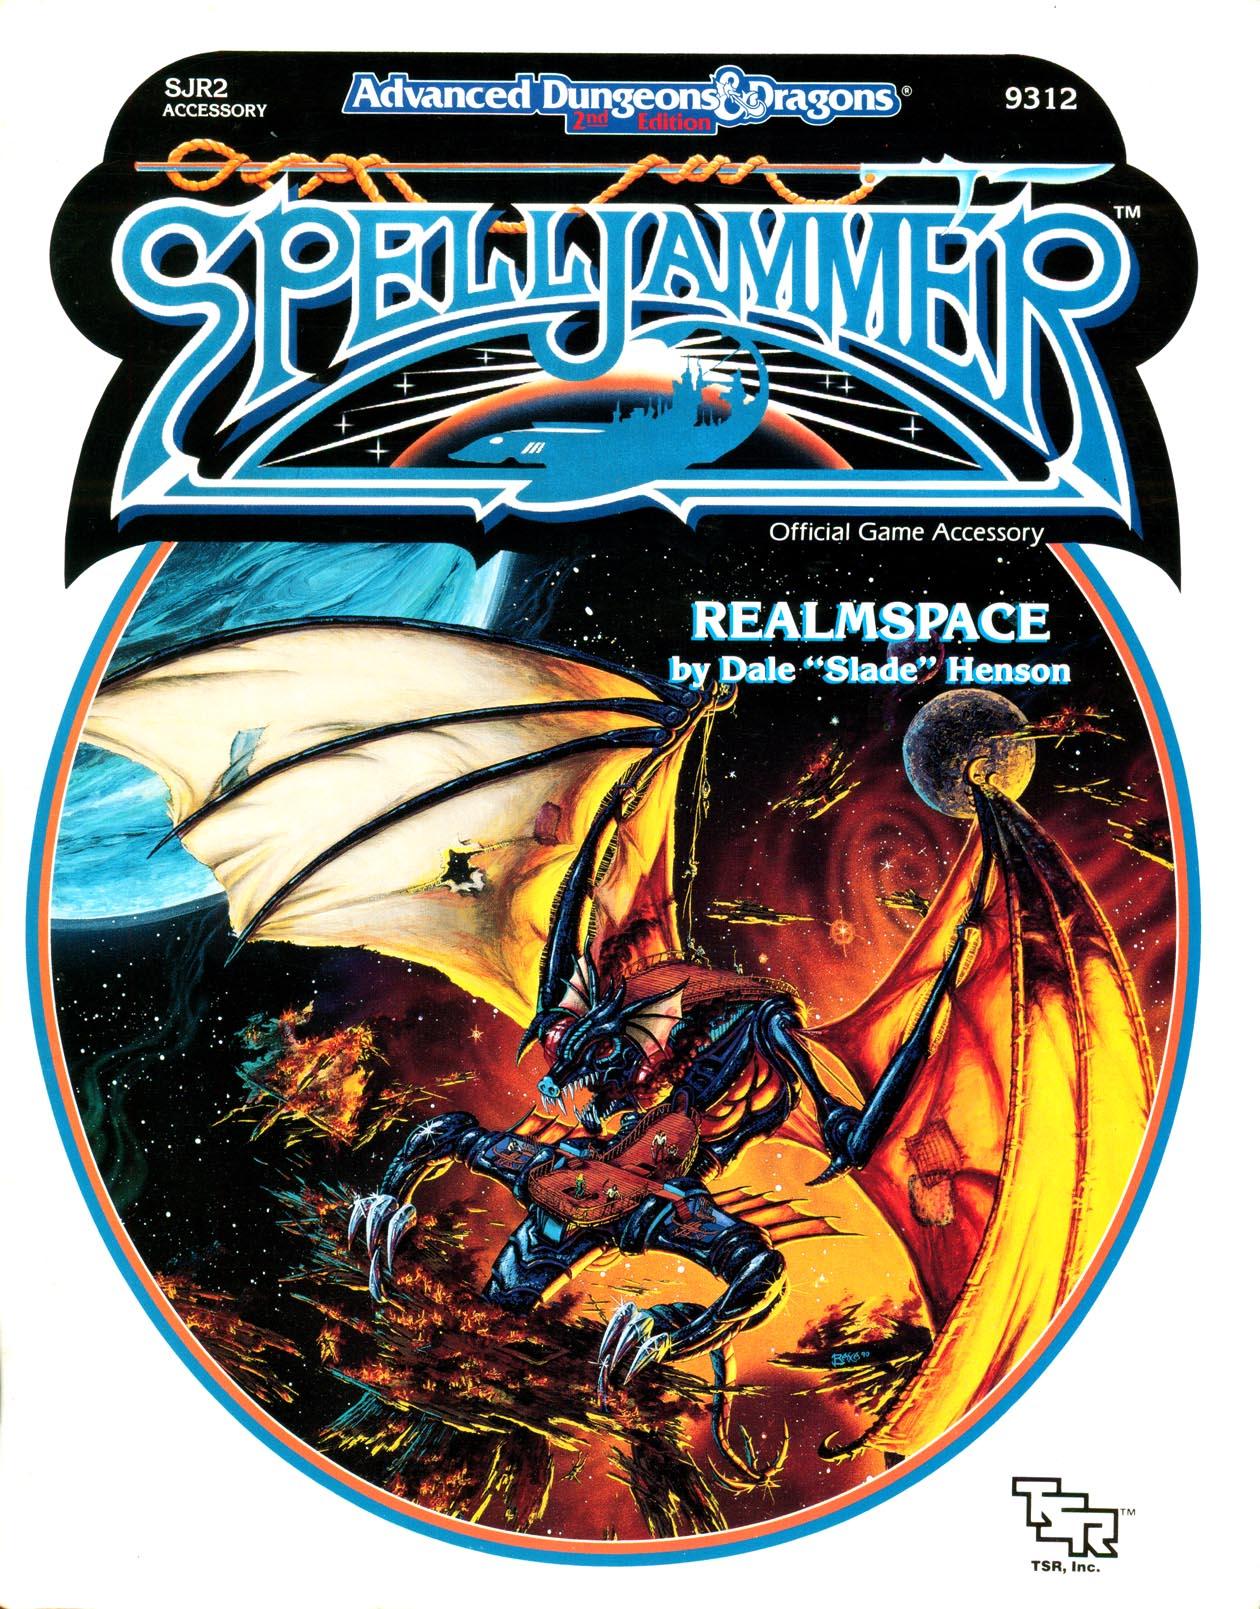 File:Spelljammer-Realmspace Book-Cover.jpg